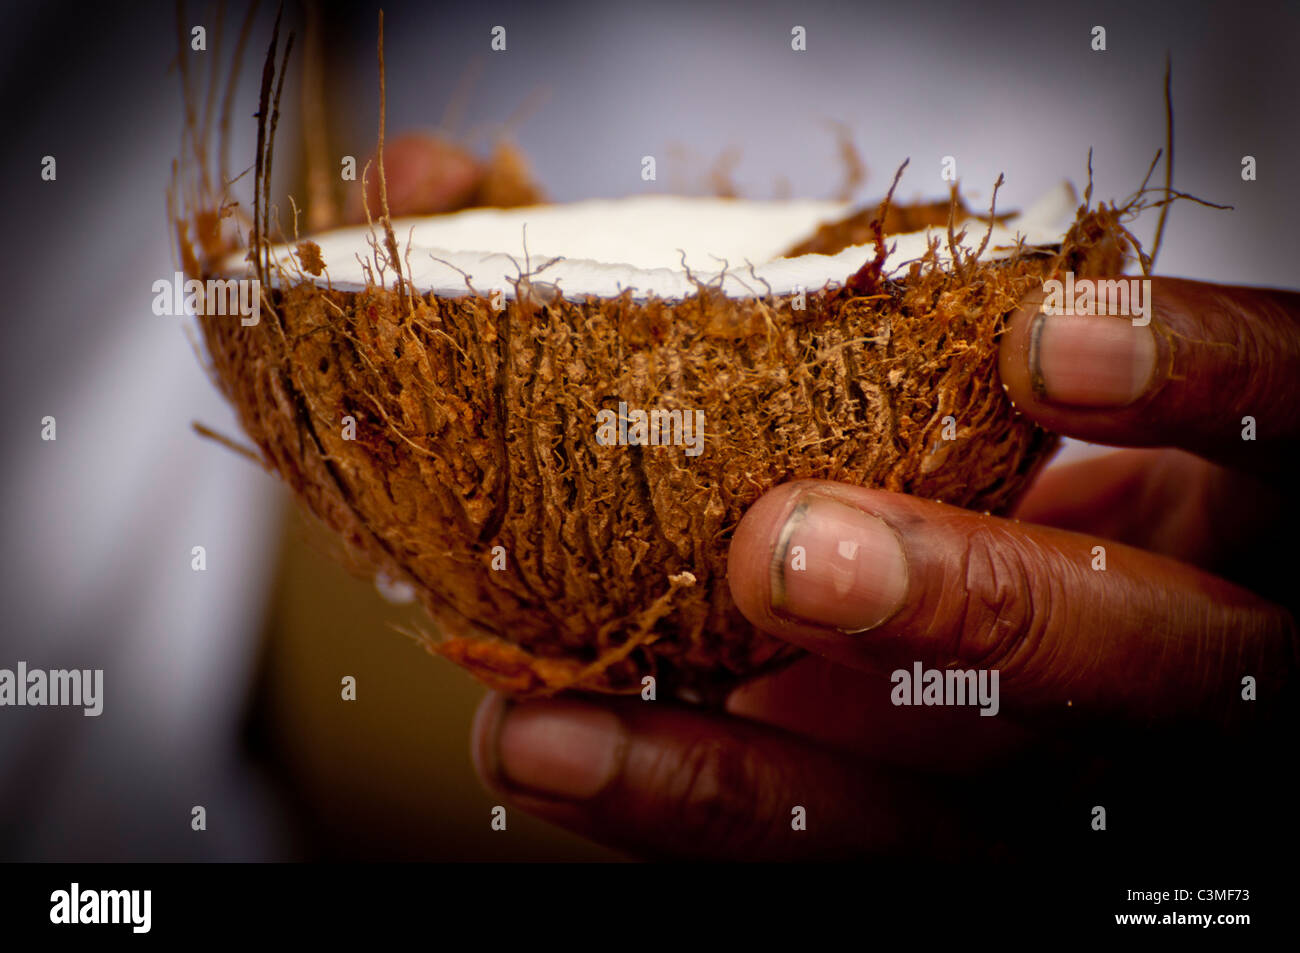 Fidschi Kellner servieren frisch geknackt Kokosmilch, Malolo Resort, Mamanucas-Inseln, Fidschi Stockbild